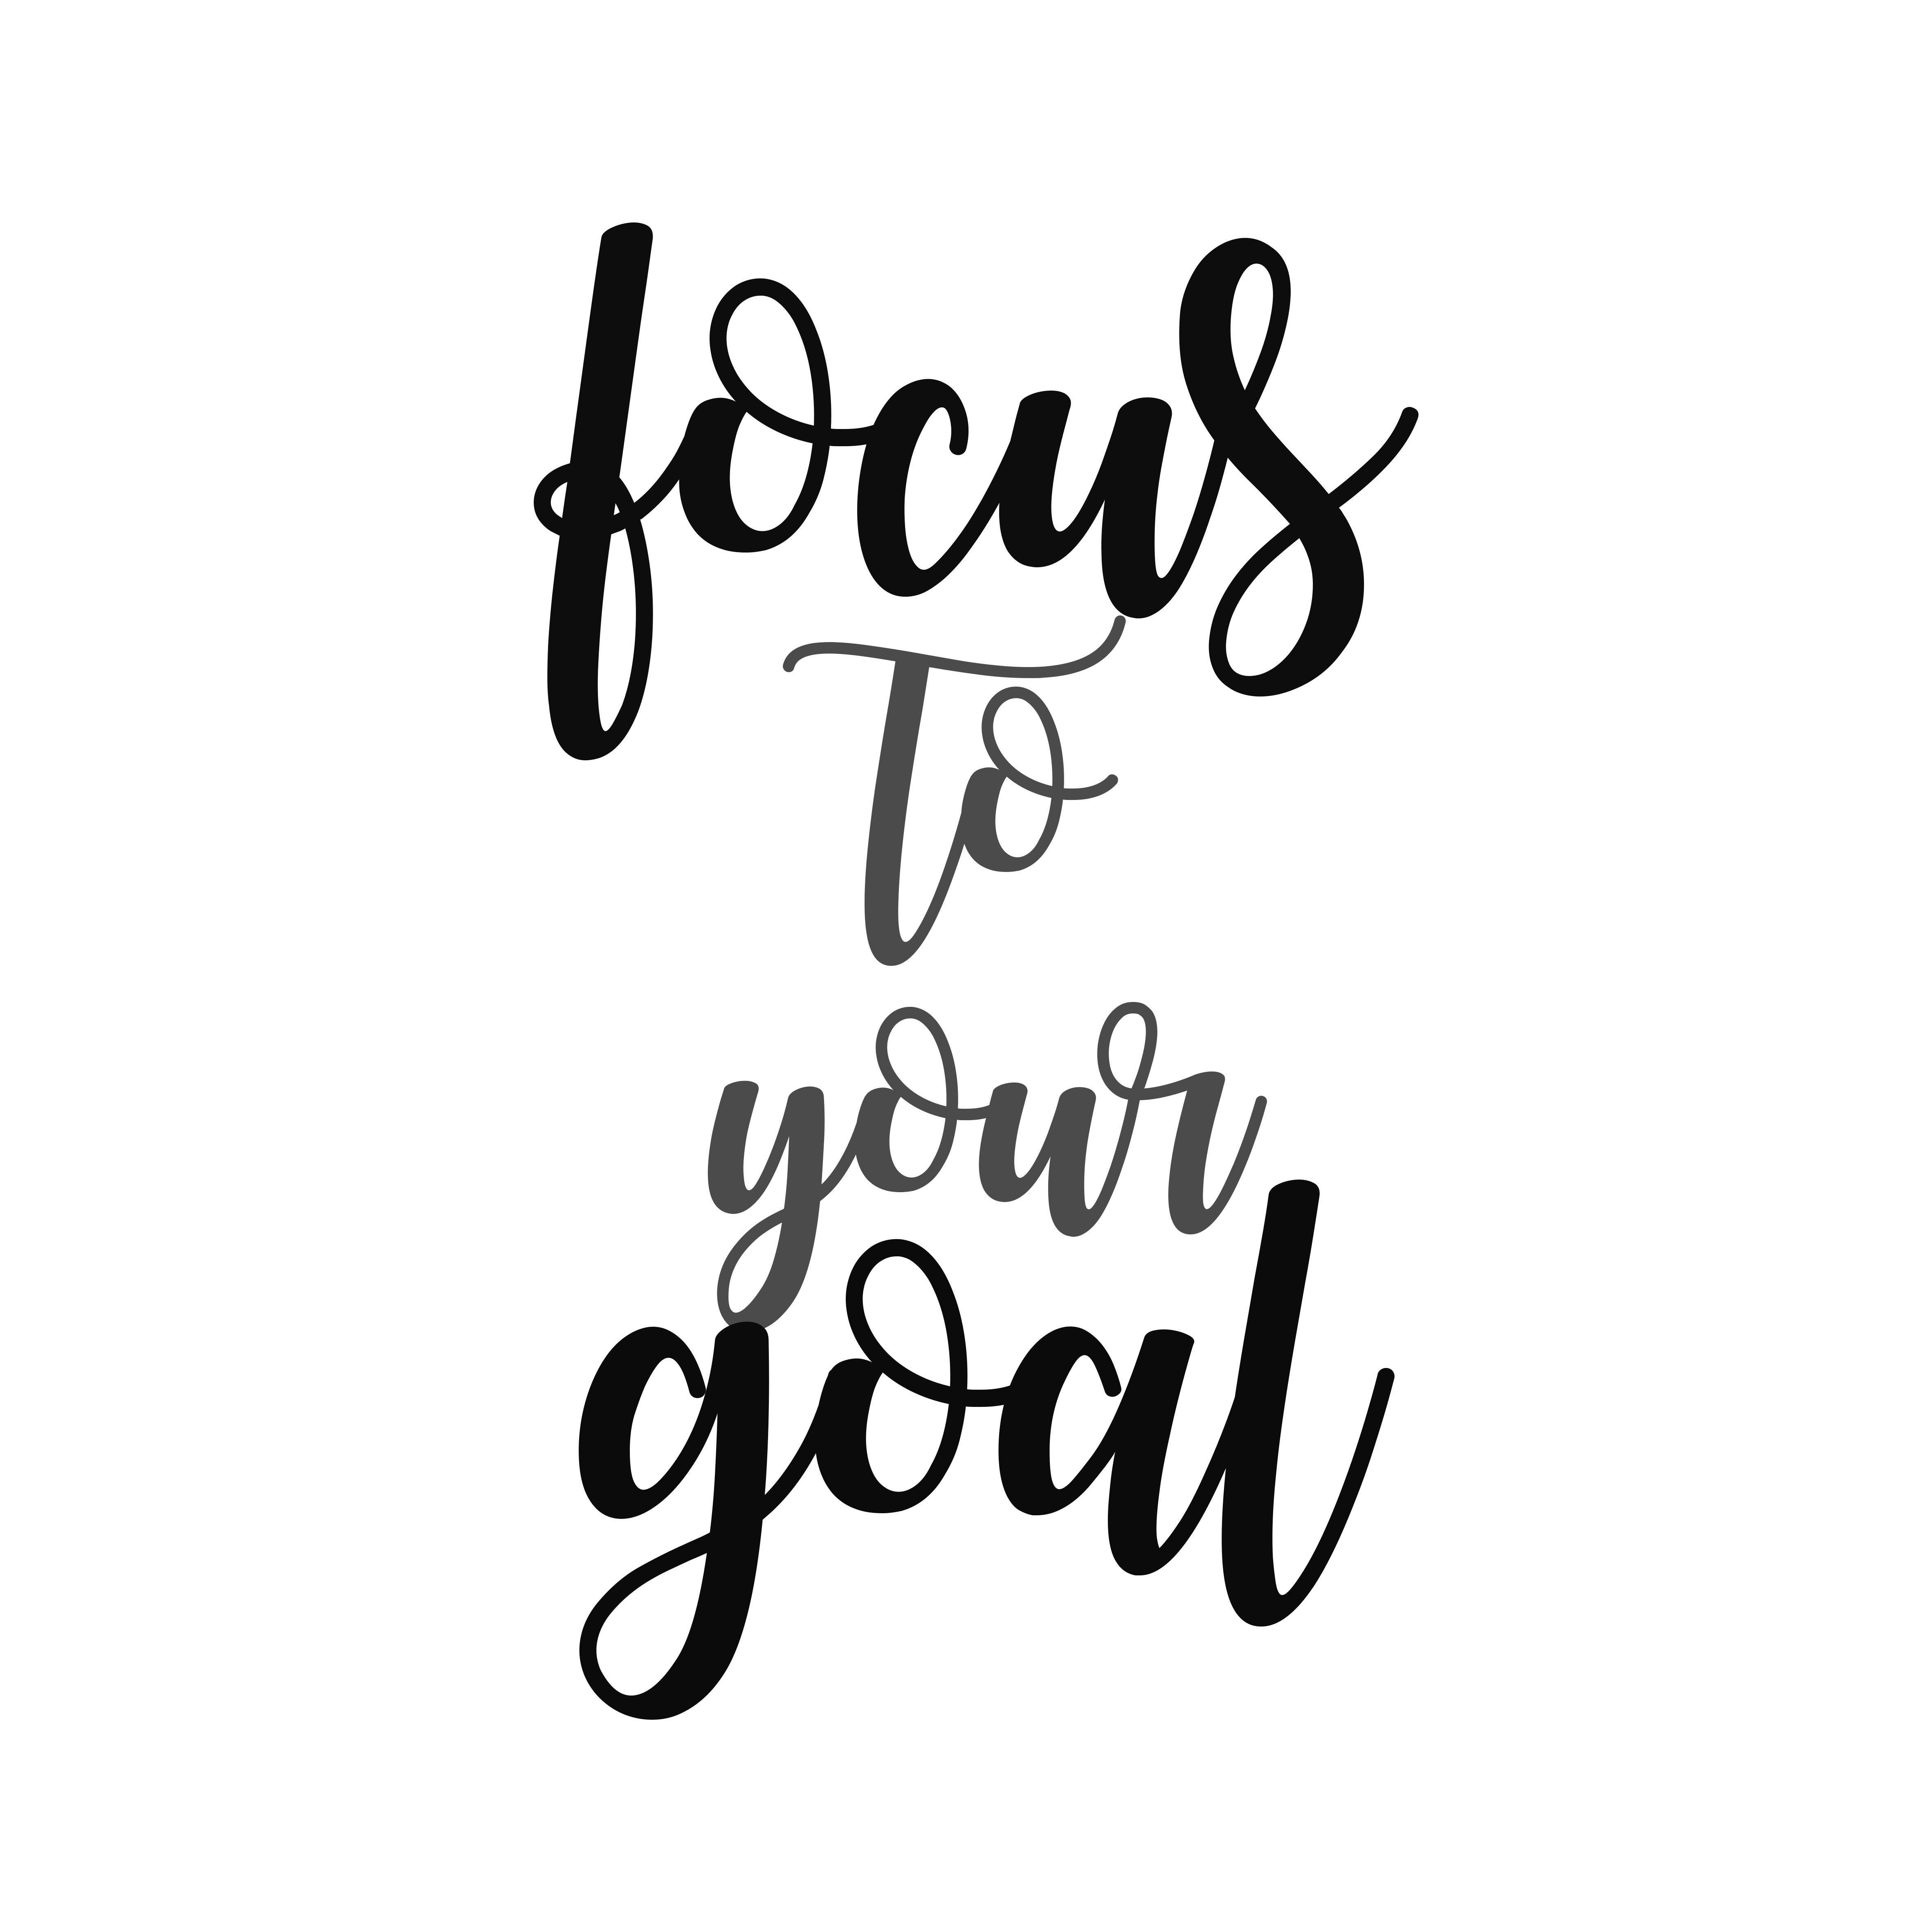 #mygoals #lifegoal #goals #youcan #motivational #quotes #love #life